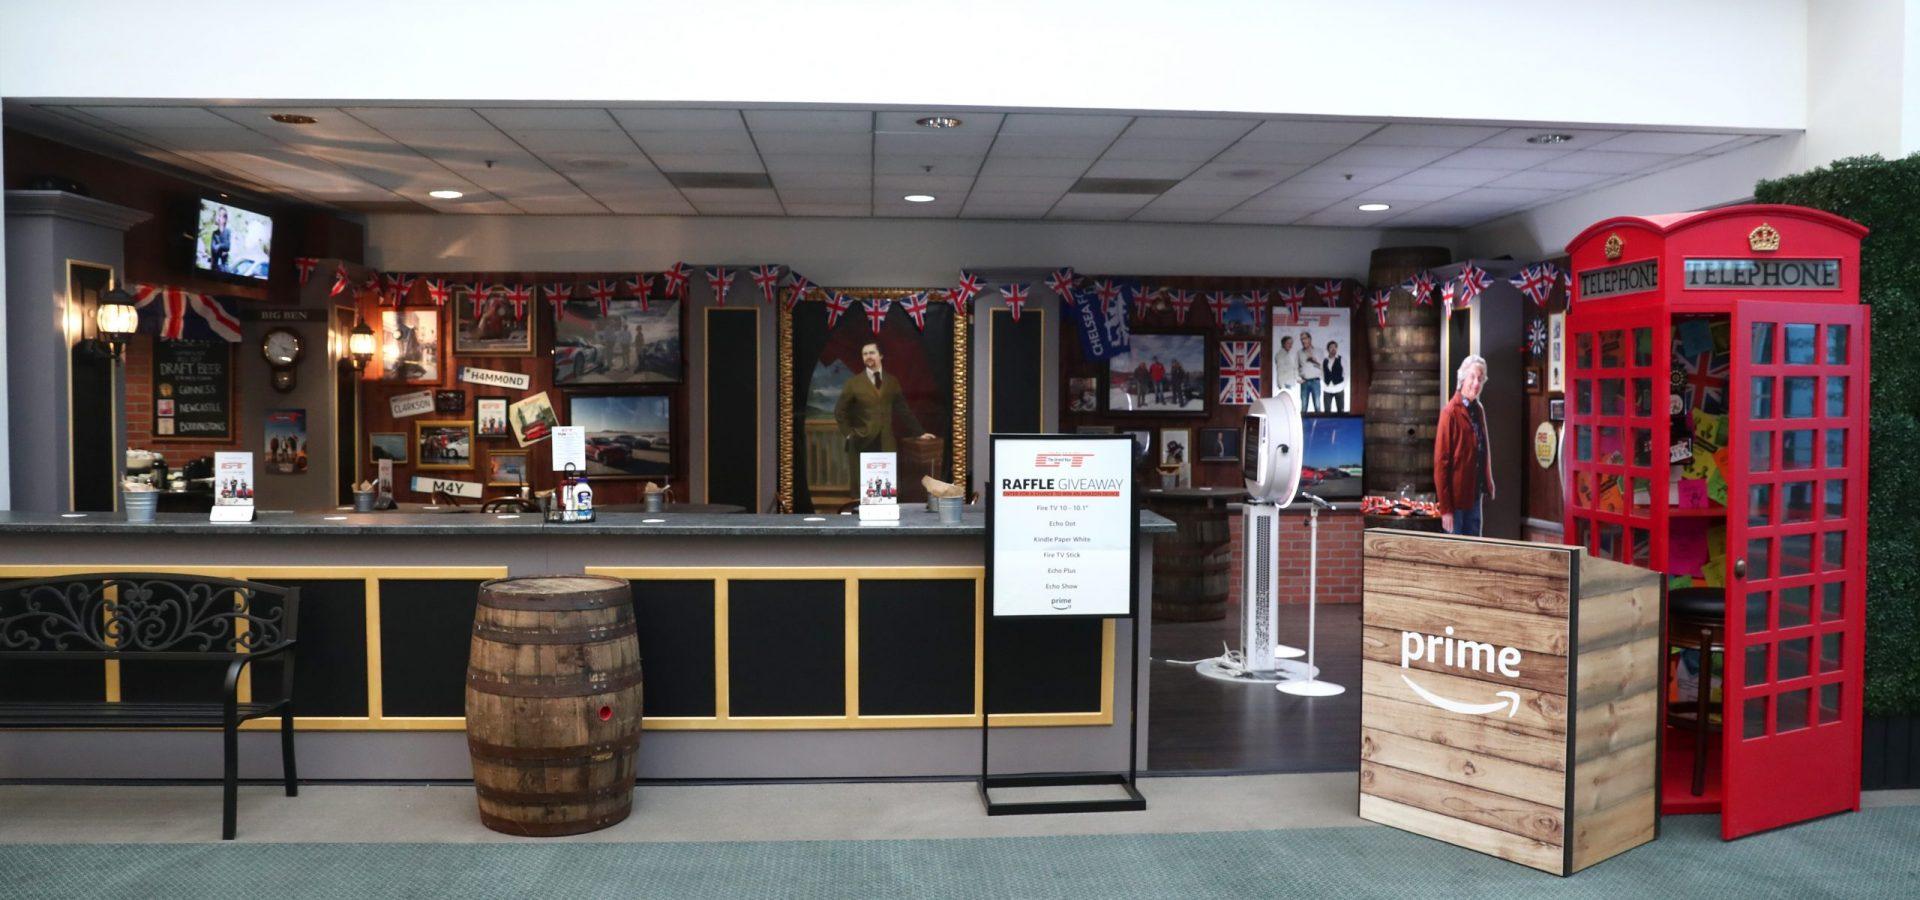 Grand Tour Pub